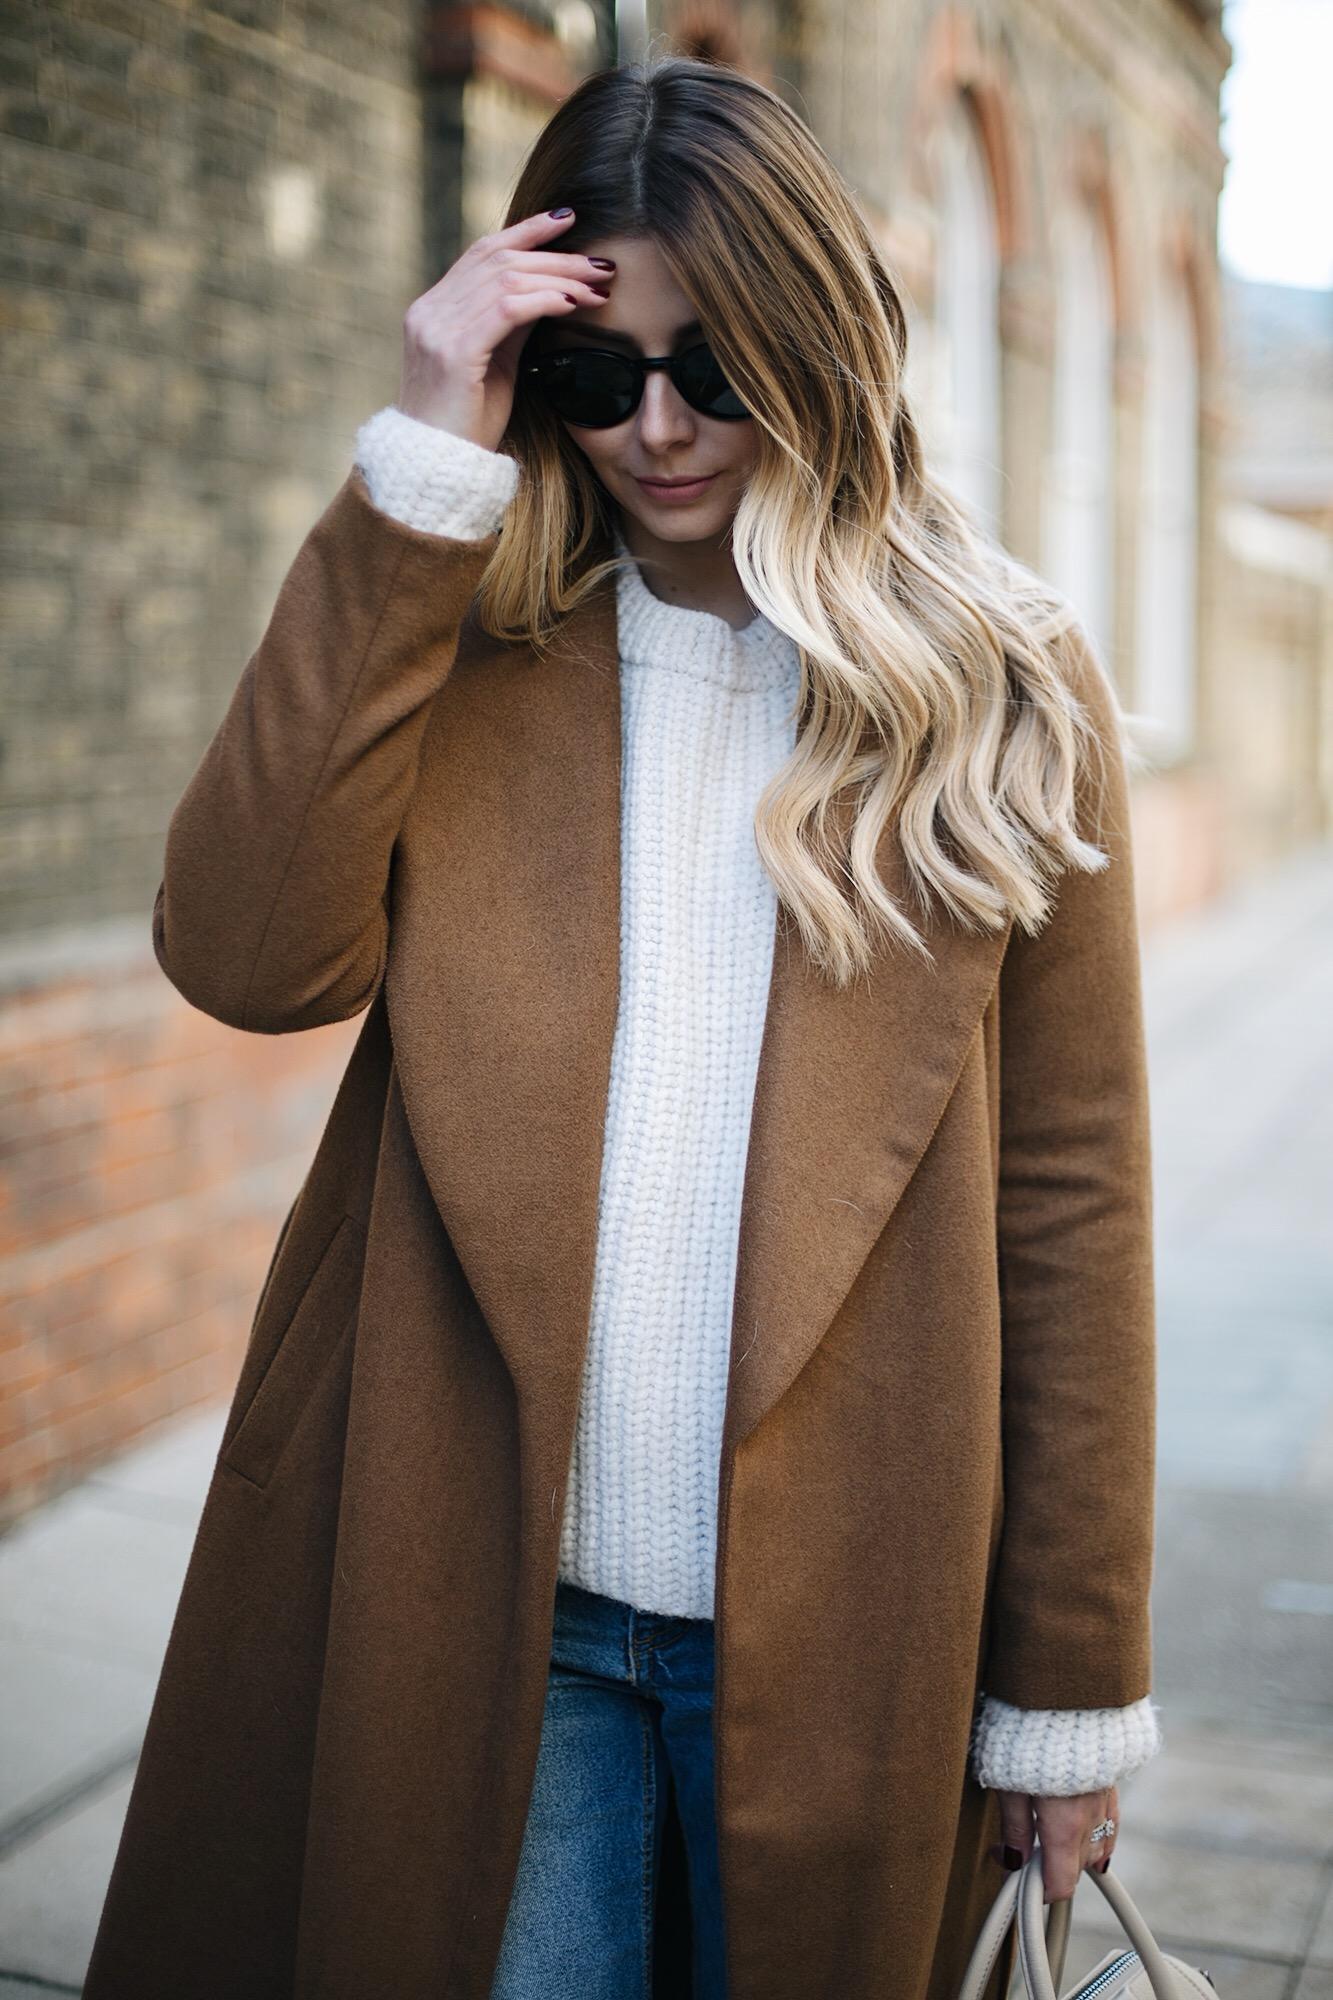 Tan coat, cream sweater, long balayage hair